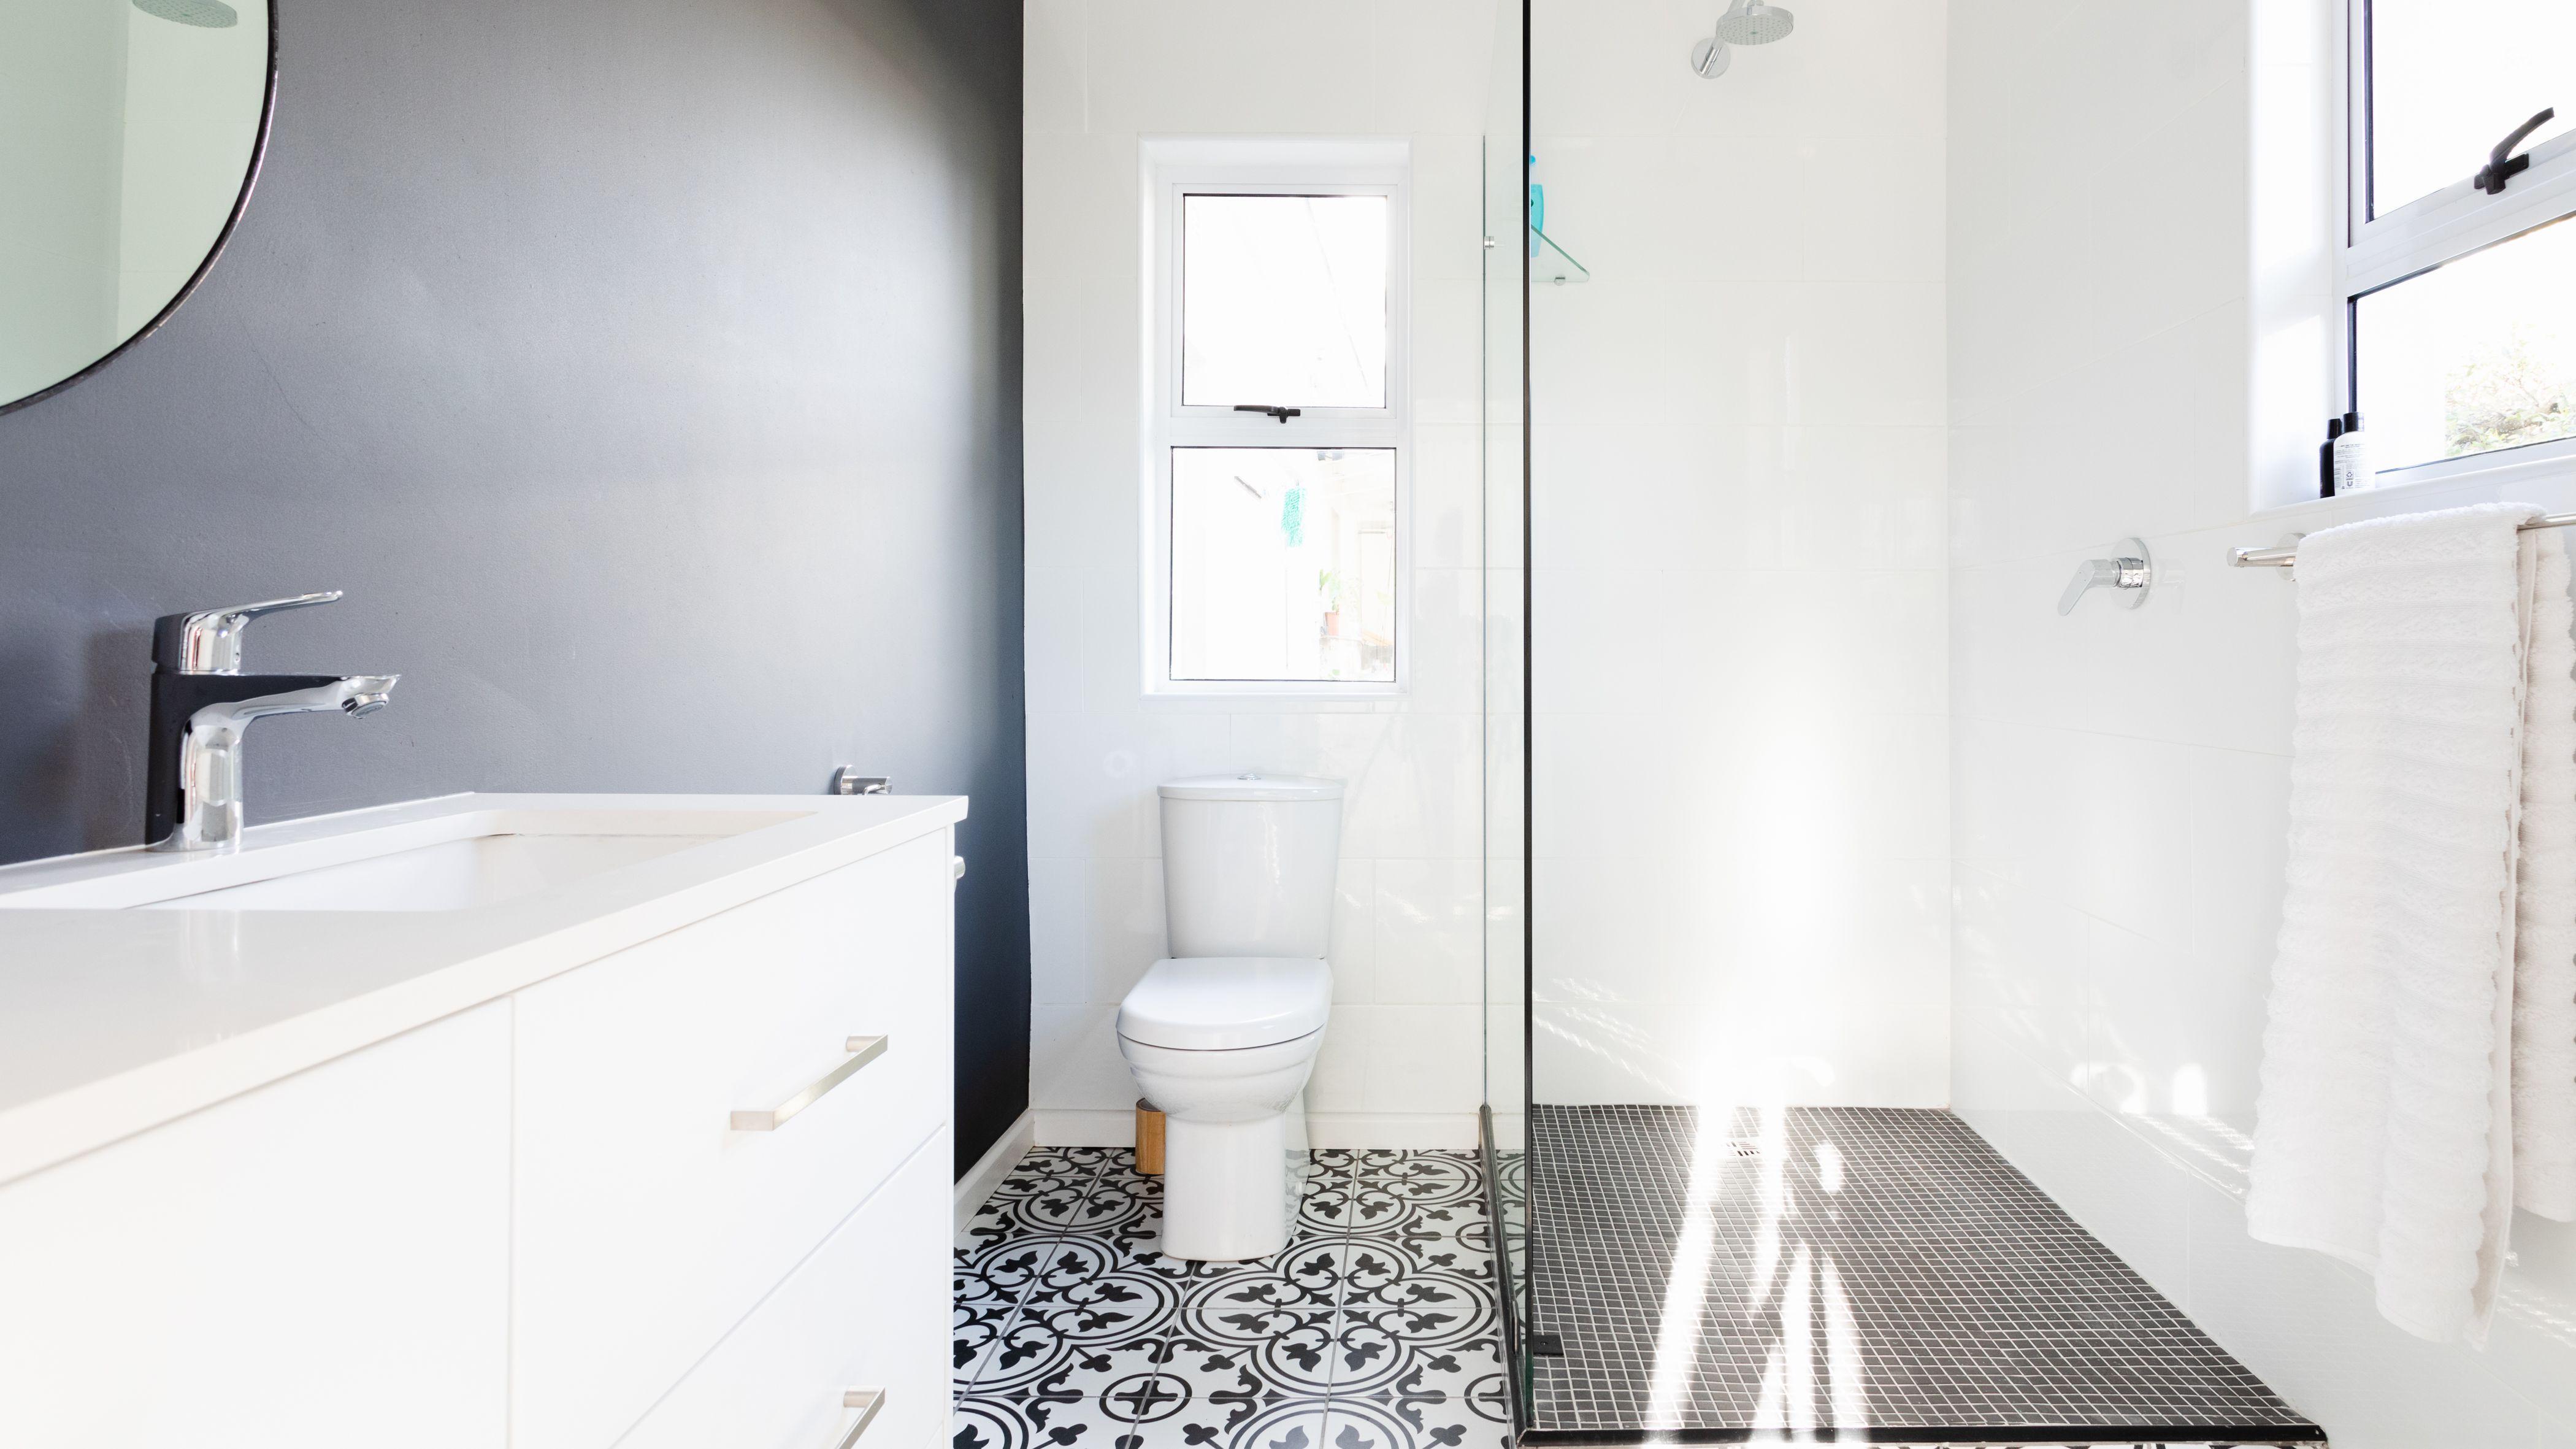 Best Flooring For Bathrooms, Should You Put Laminate Flooring In Bathrooms